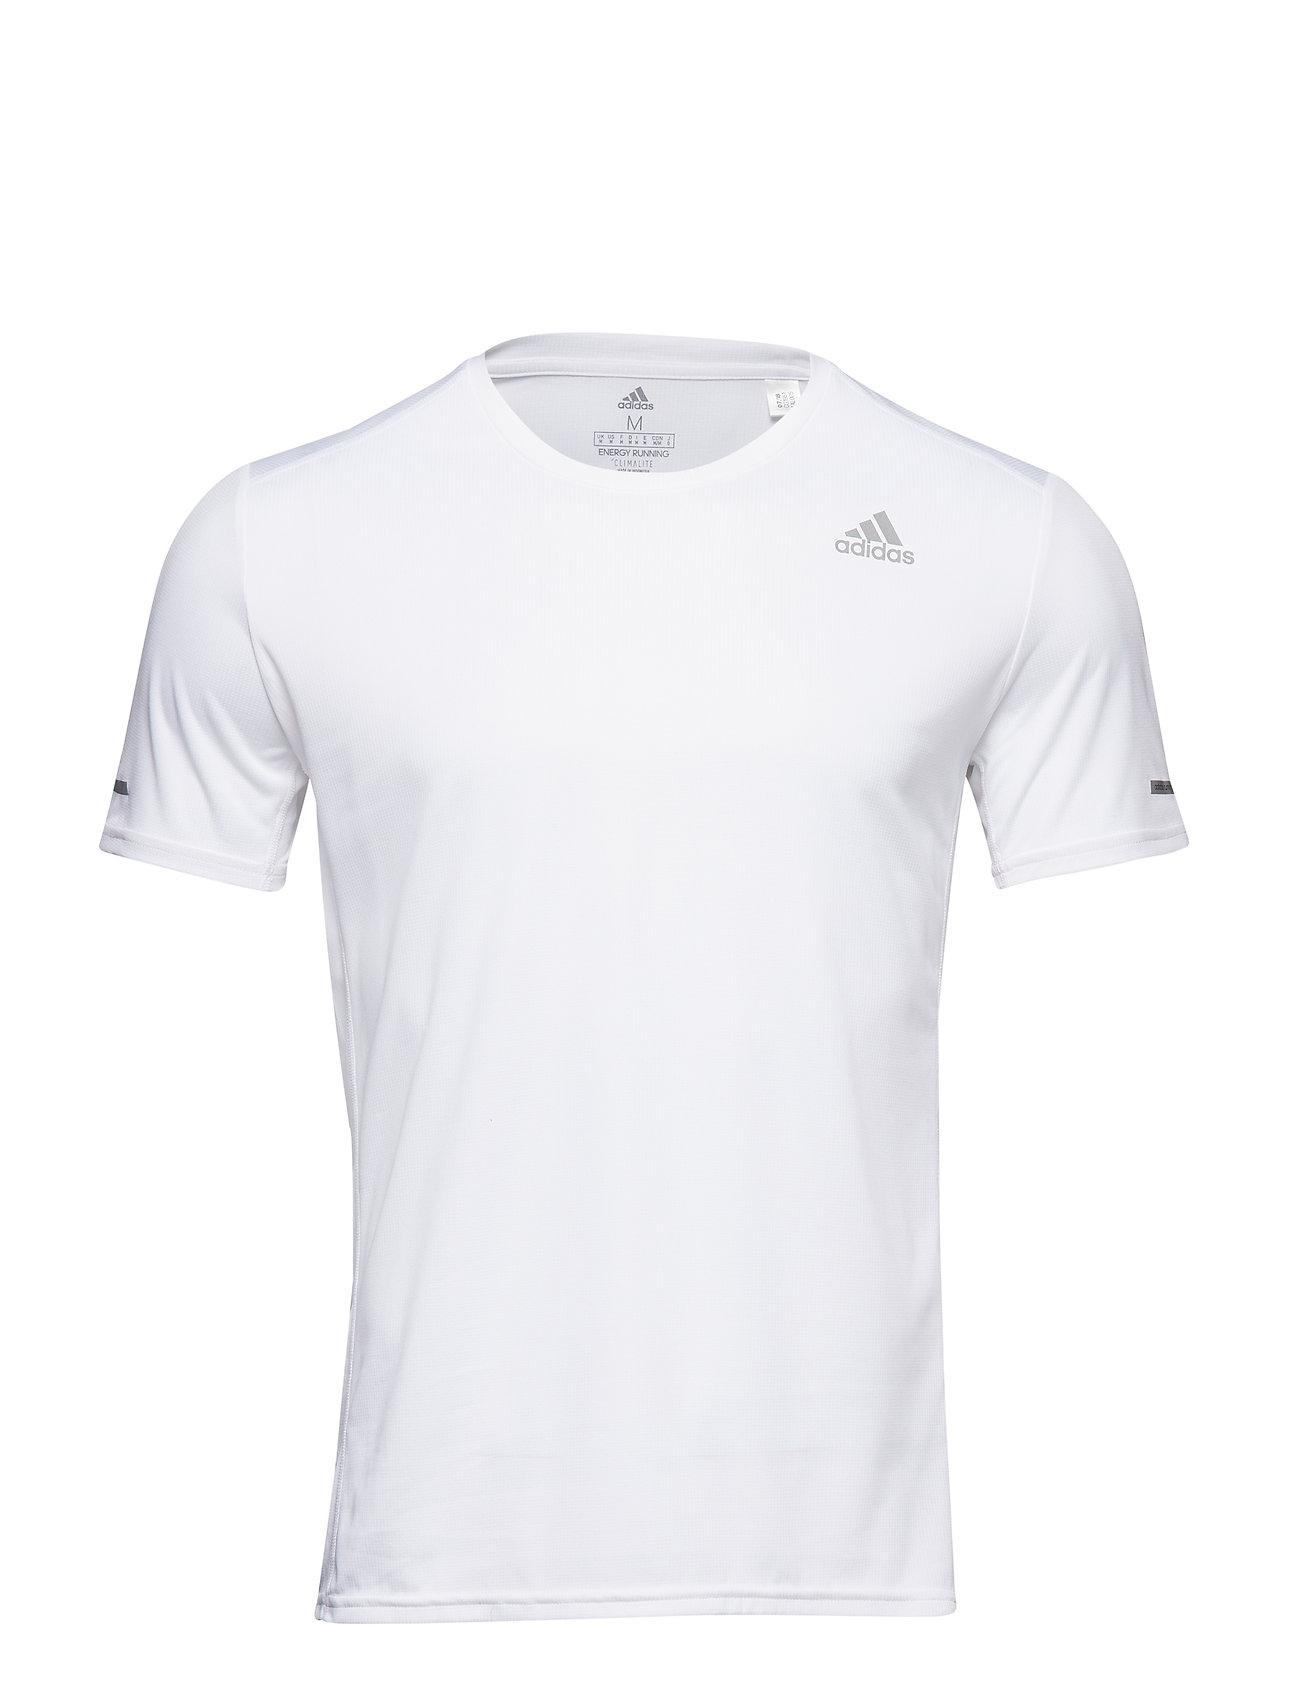 adidas Performance RUN TEE M - WHITE